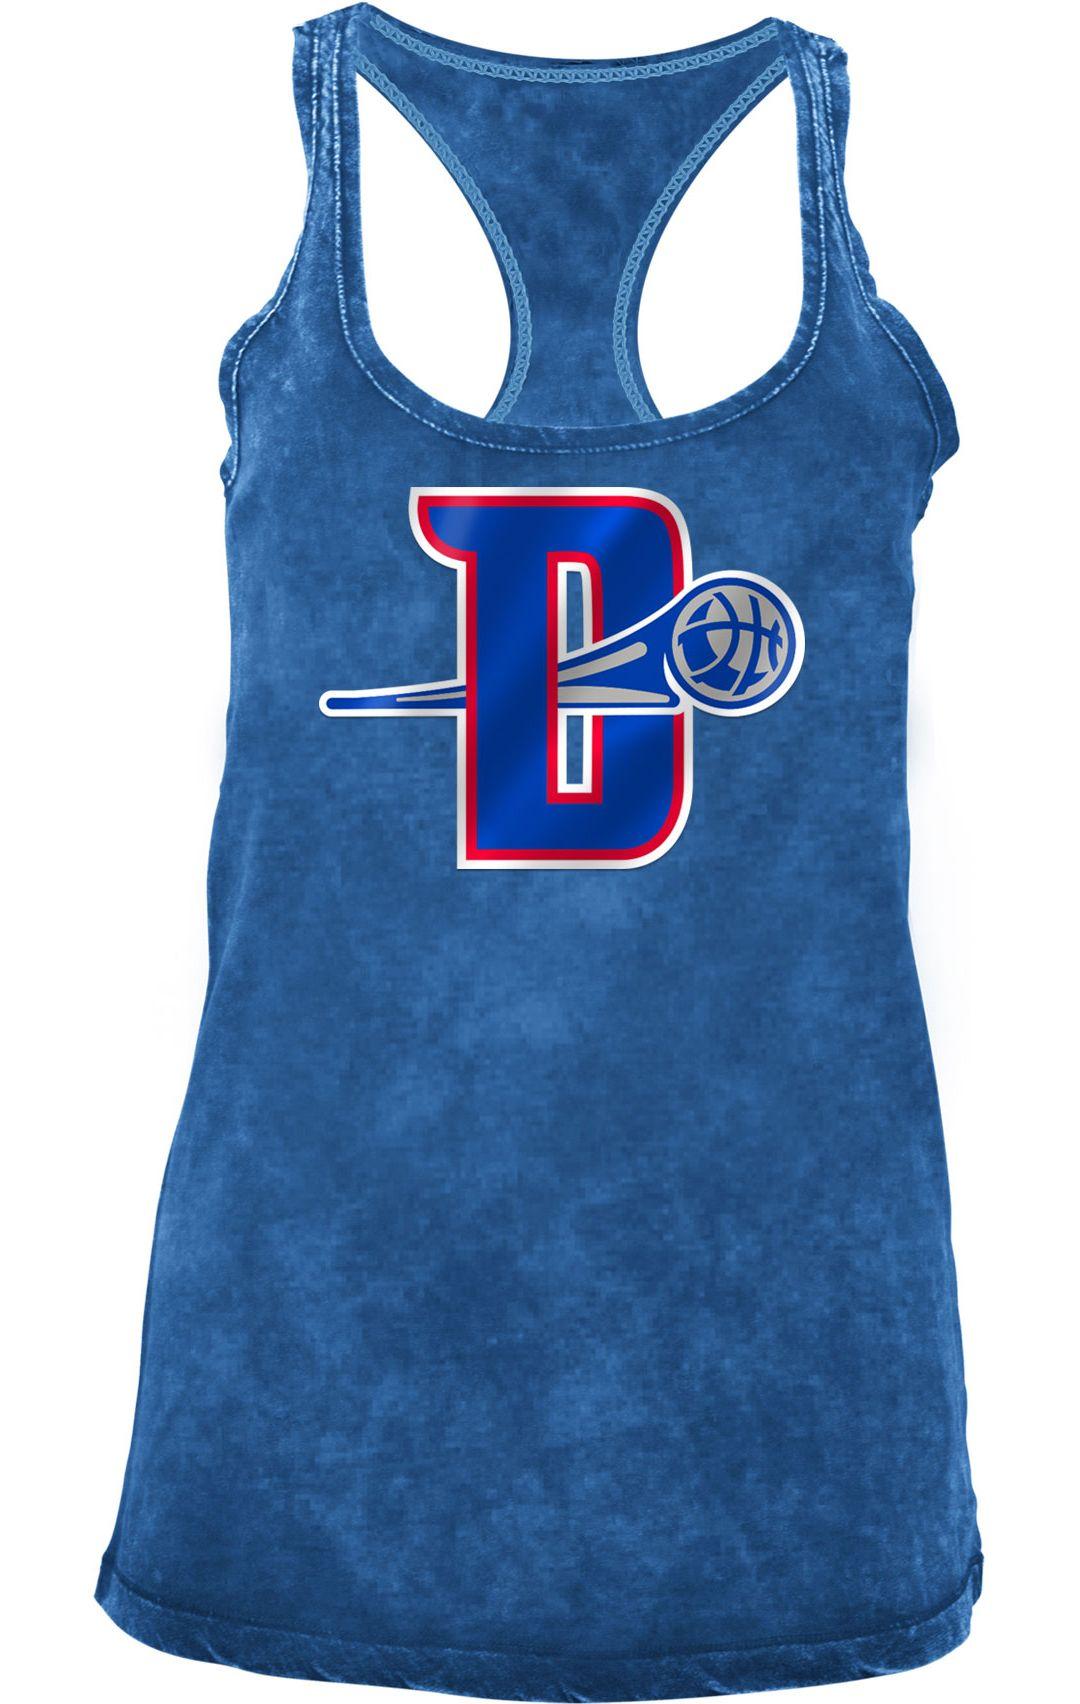 online store c5fd8 3cfe5 New Era Women's Detroit Pistons Mineral Tank